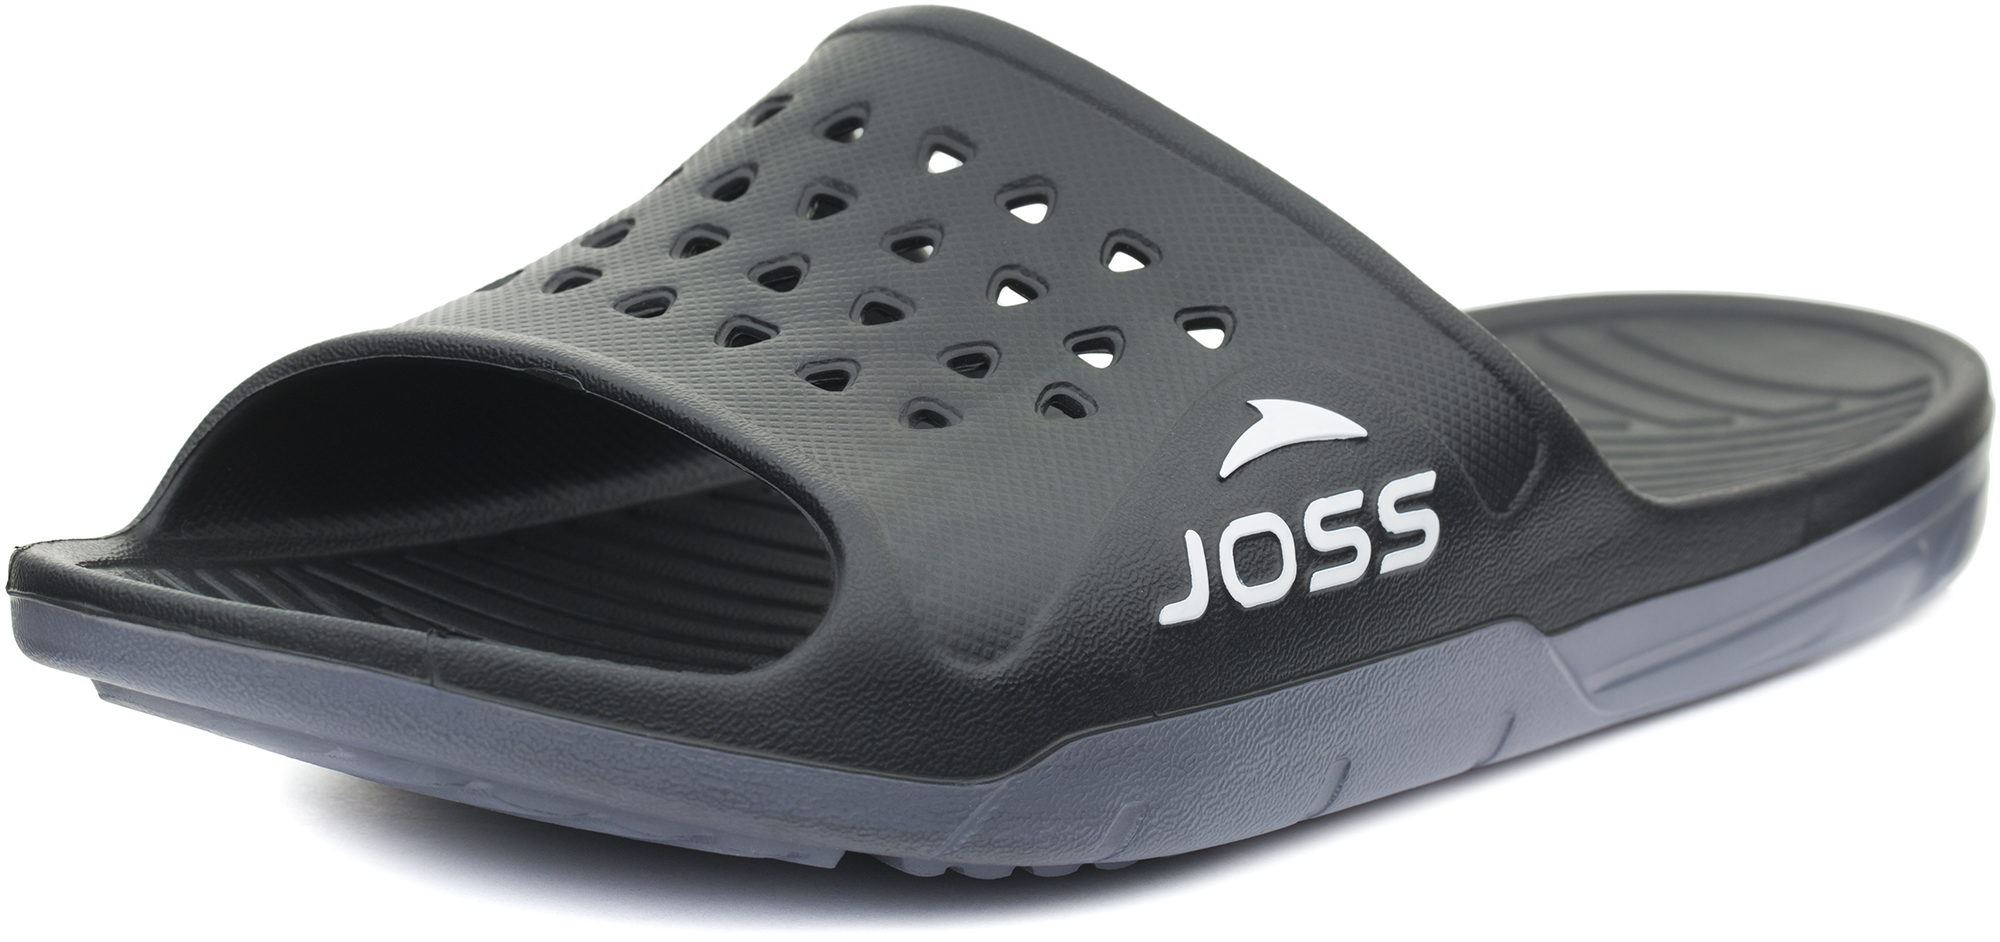 цена Joss Шлепанцы мужские Joss Eclipse, размер 45 онлайн в 2017 году